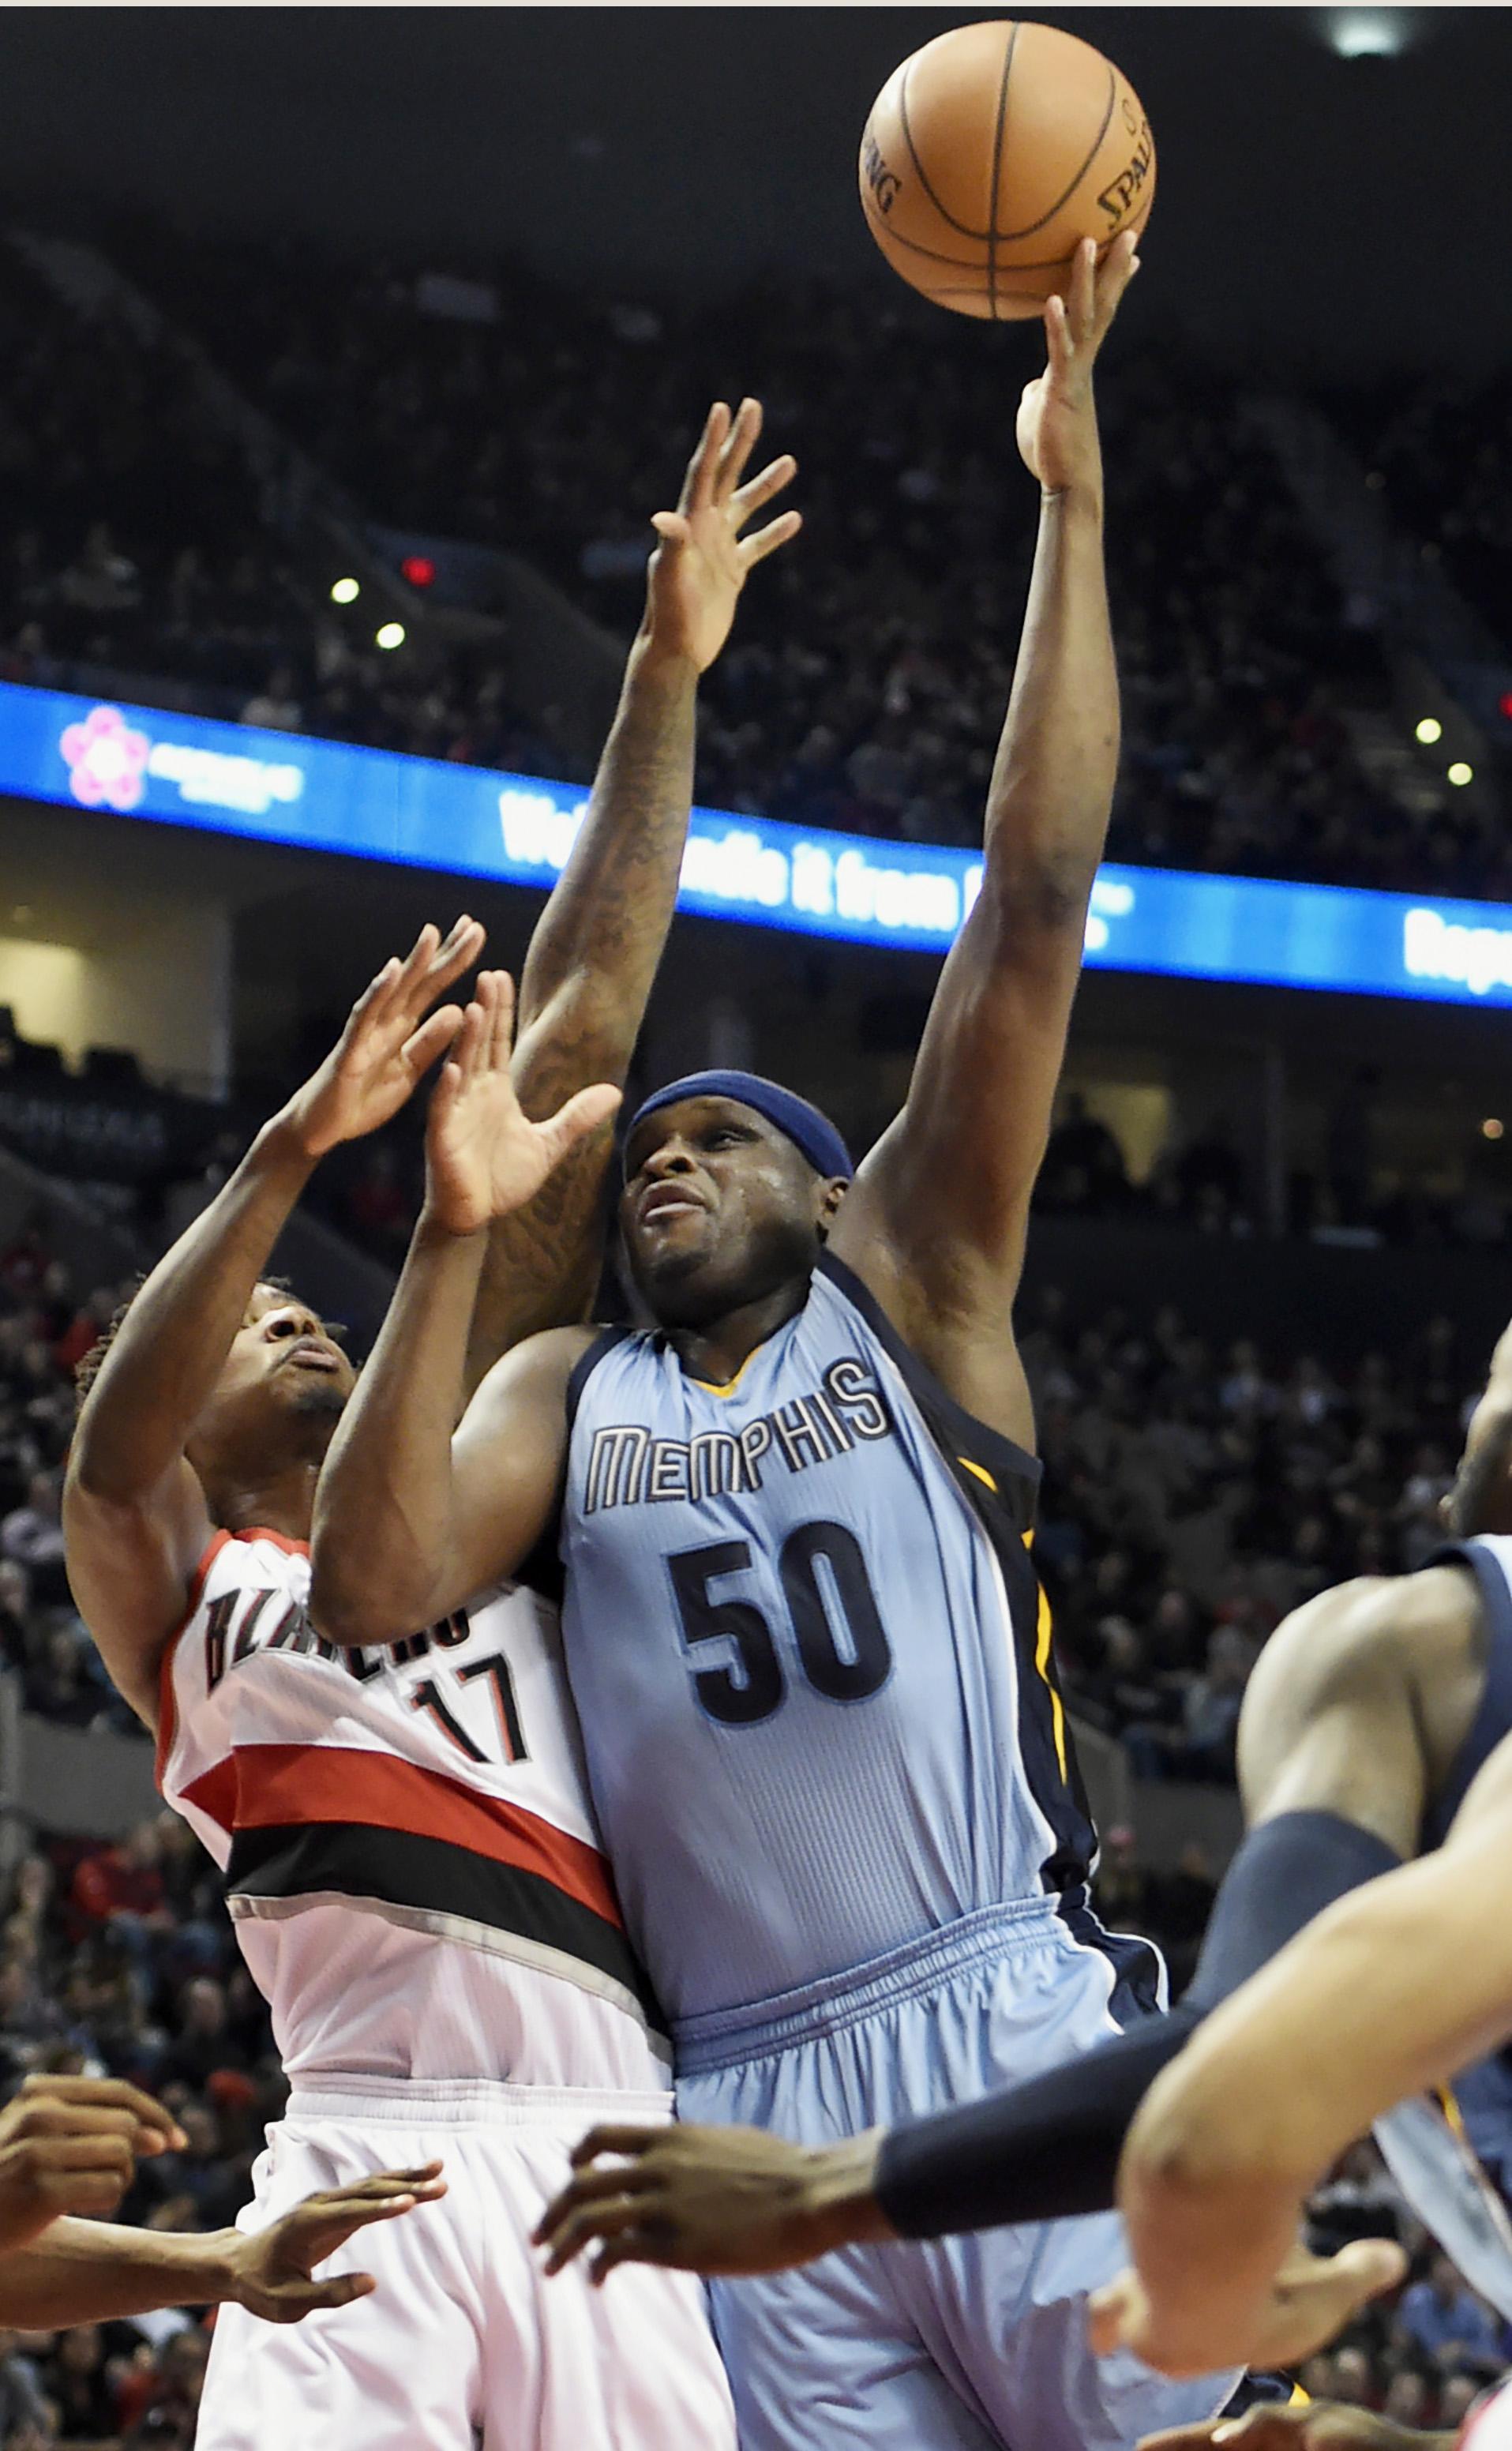 Zach randolph memphis grizzlies - Memphis Grizzlies Forward Zach Randolph 50 Shoots The Ball On Portland Trail Blazers Center